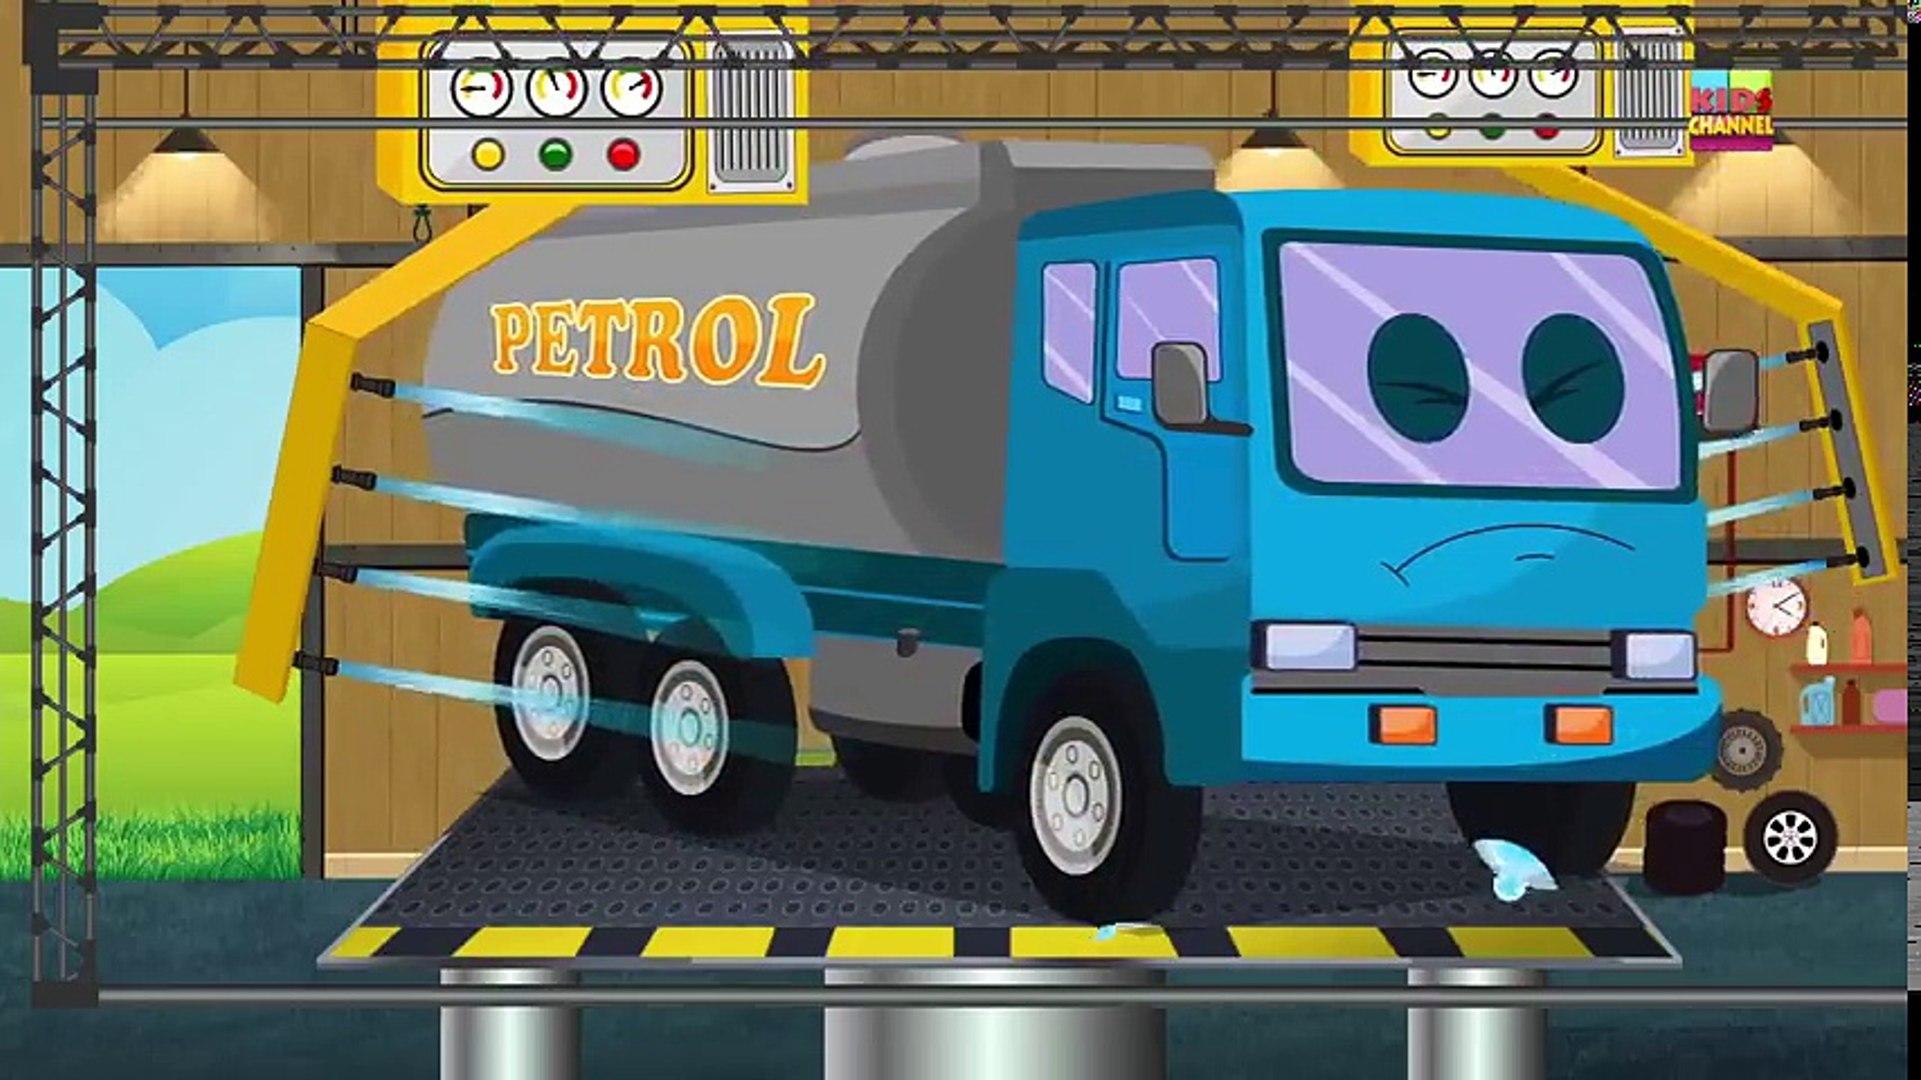 Tv cartoons movies 2019 Car Wash   Fire Truck   Cartoon For Children   Trucks Kids Show   Toddlers V